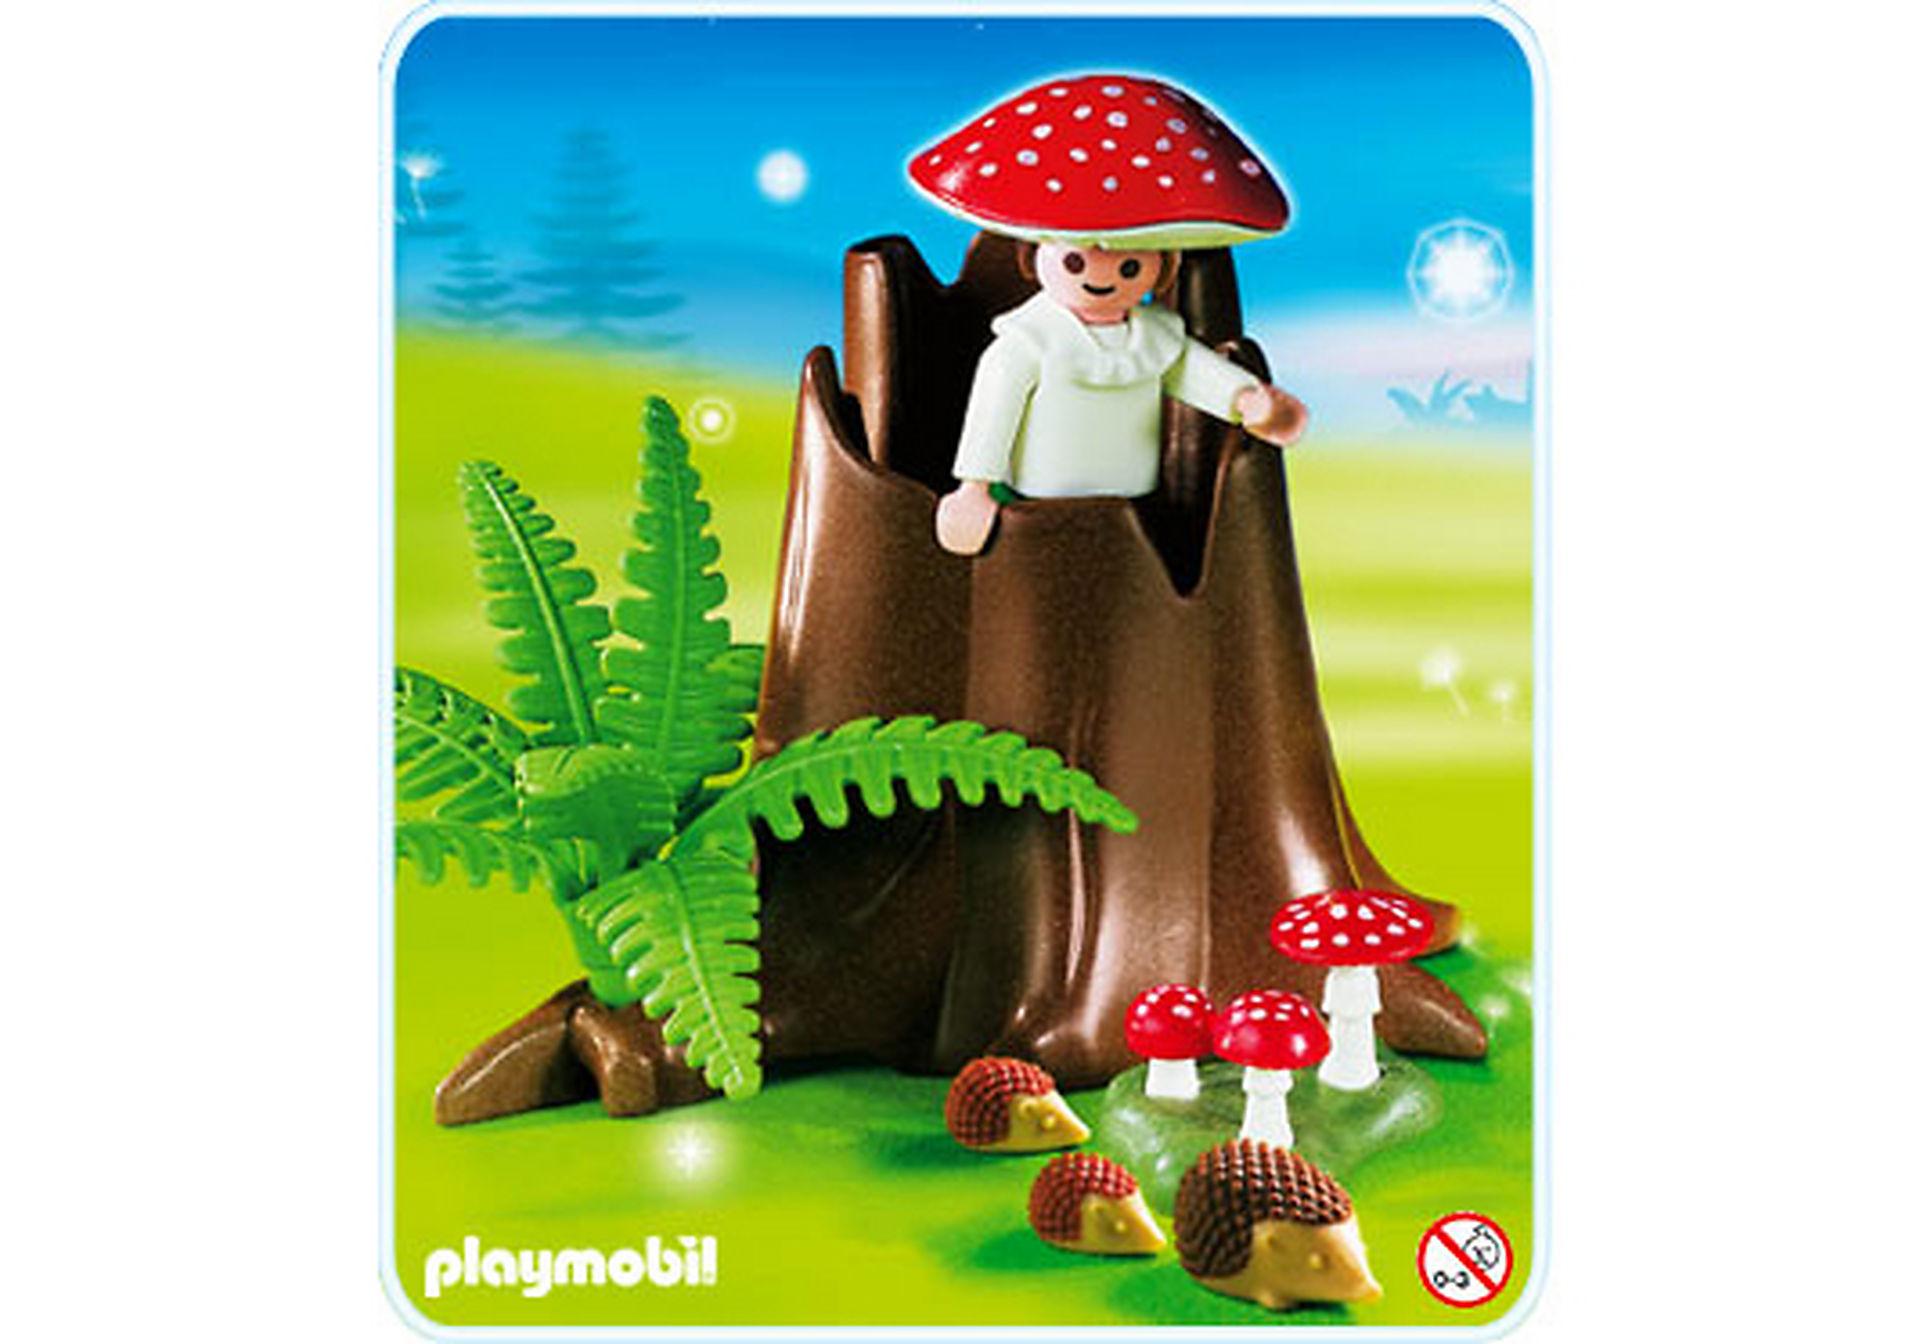 http://media.playmobil.com/i/playmobil/4194-A_product_detail/Fliegenpilzelf im Versteck